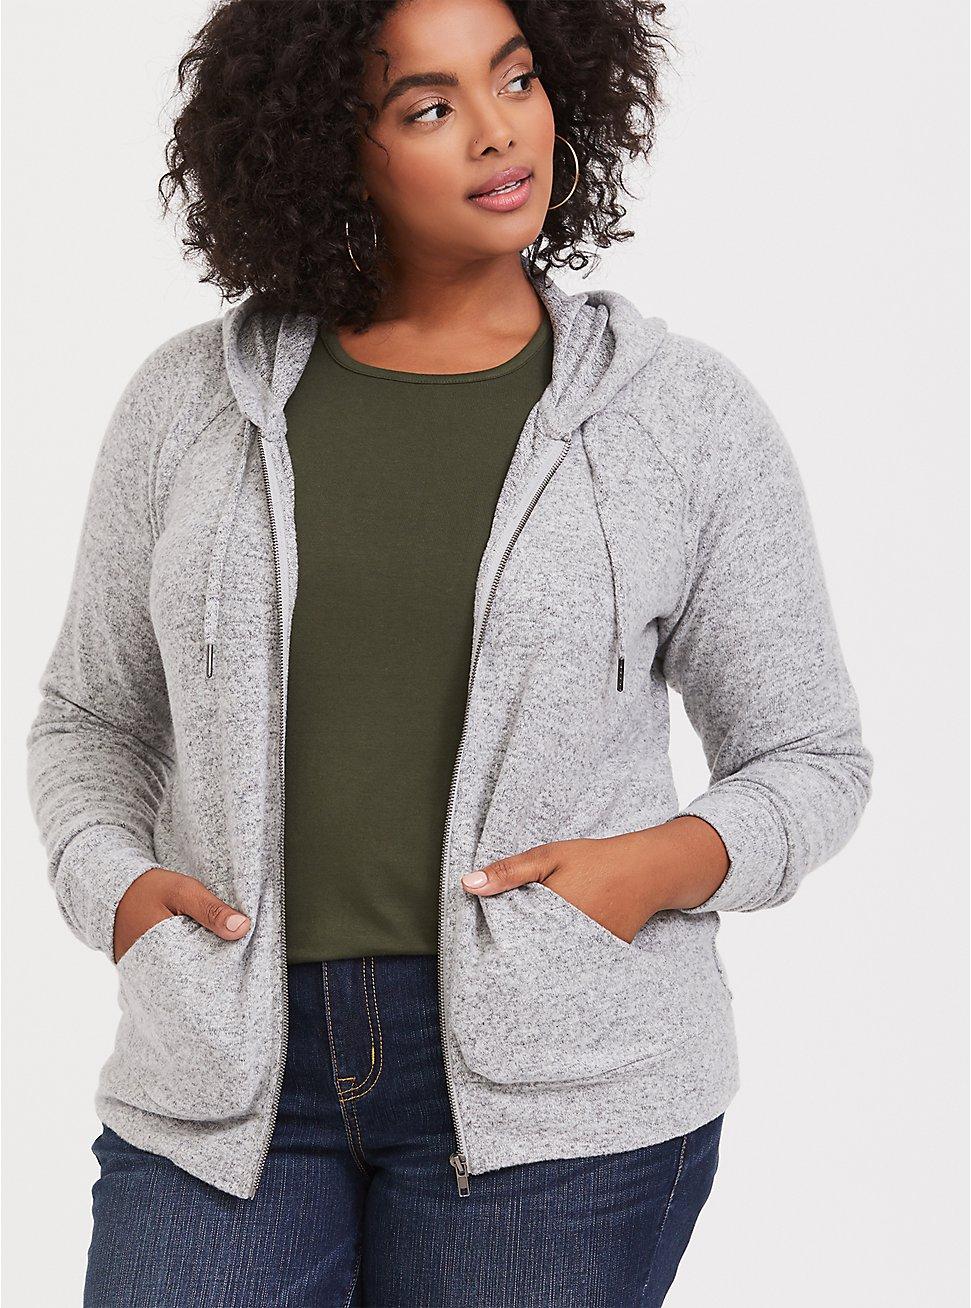 Super Soft Plush Light Grey Zip Hoodie, HEATHER GREY, hi-res